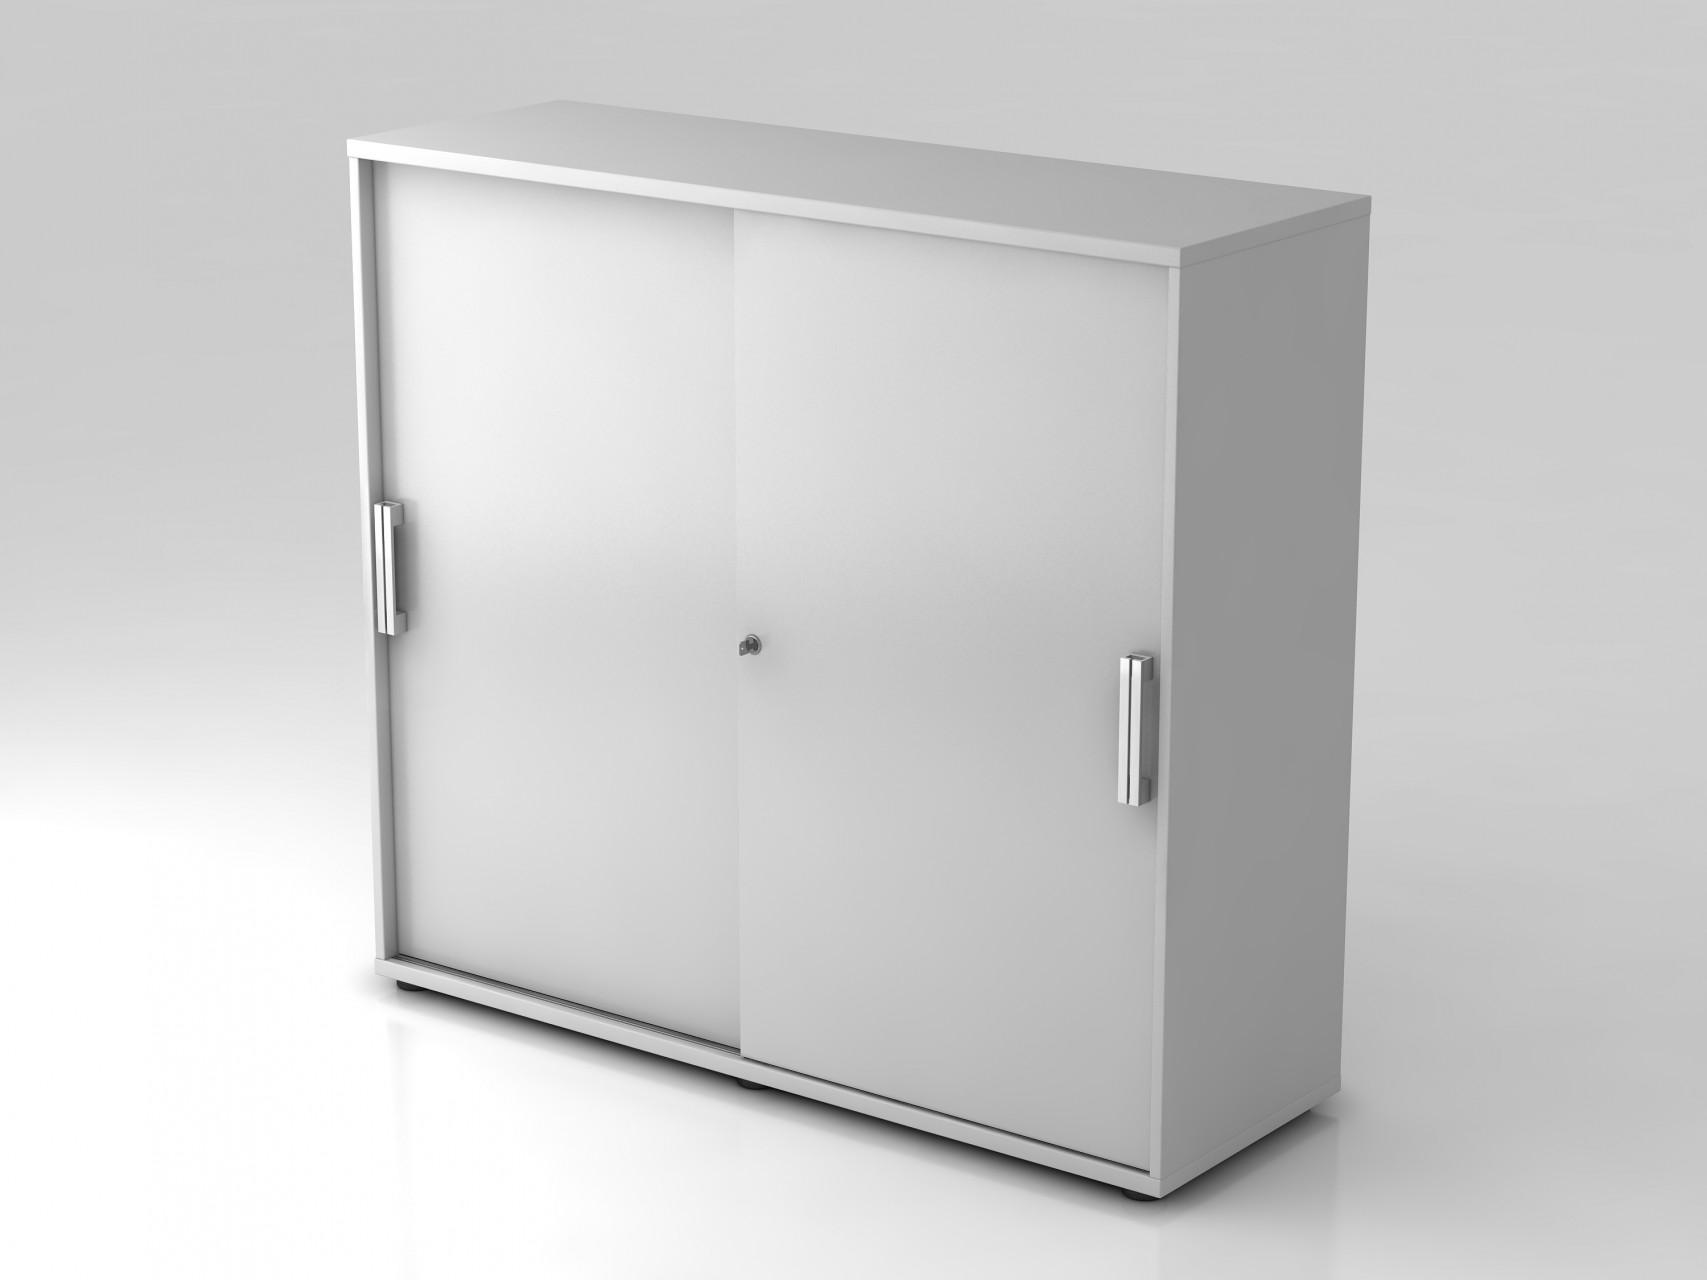 armoires portes coulissantes h110 cm achat armoires. Black Bedroom Furniture Sets. Home Design Ideas